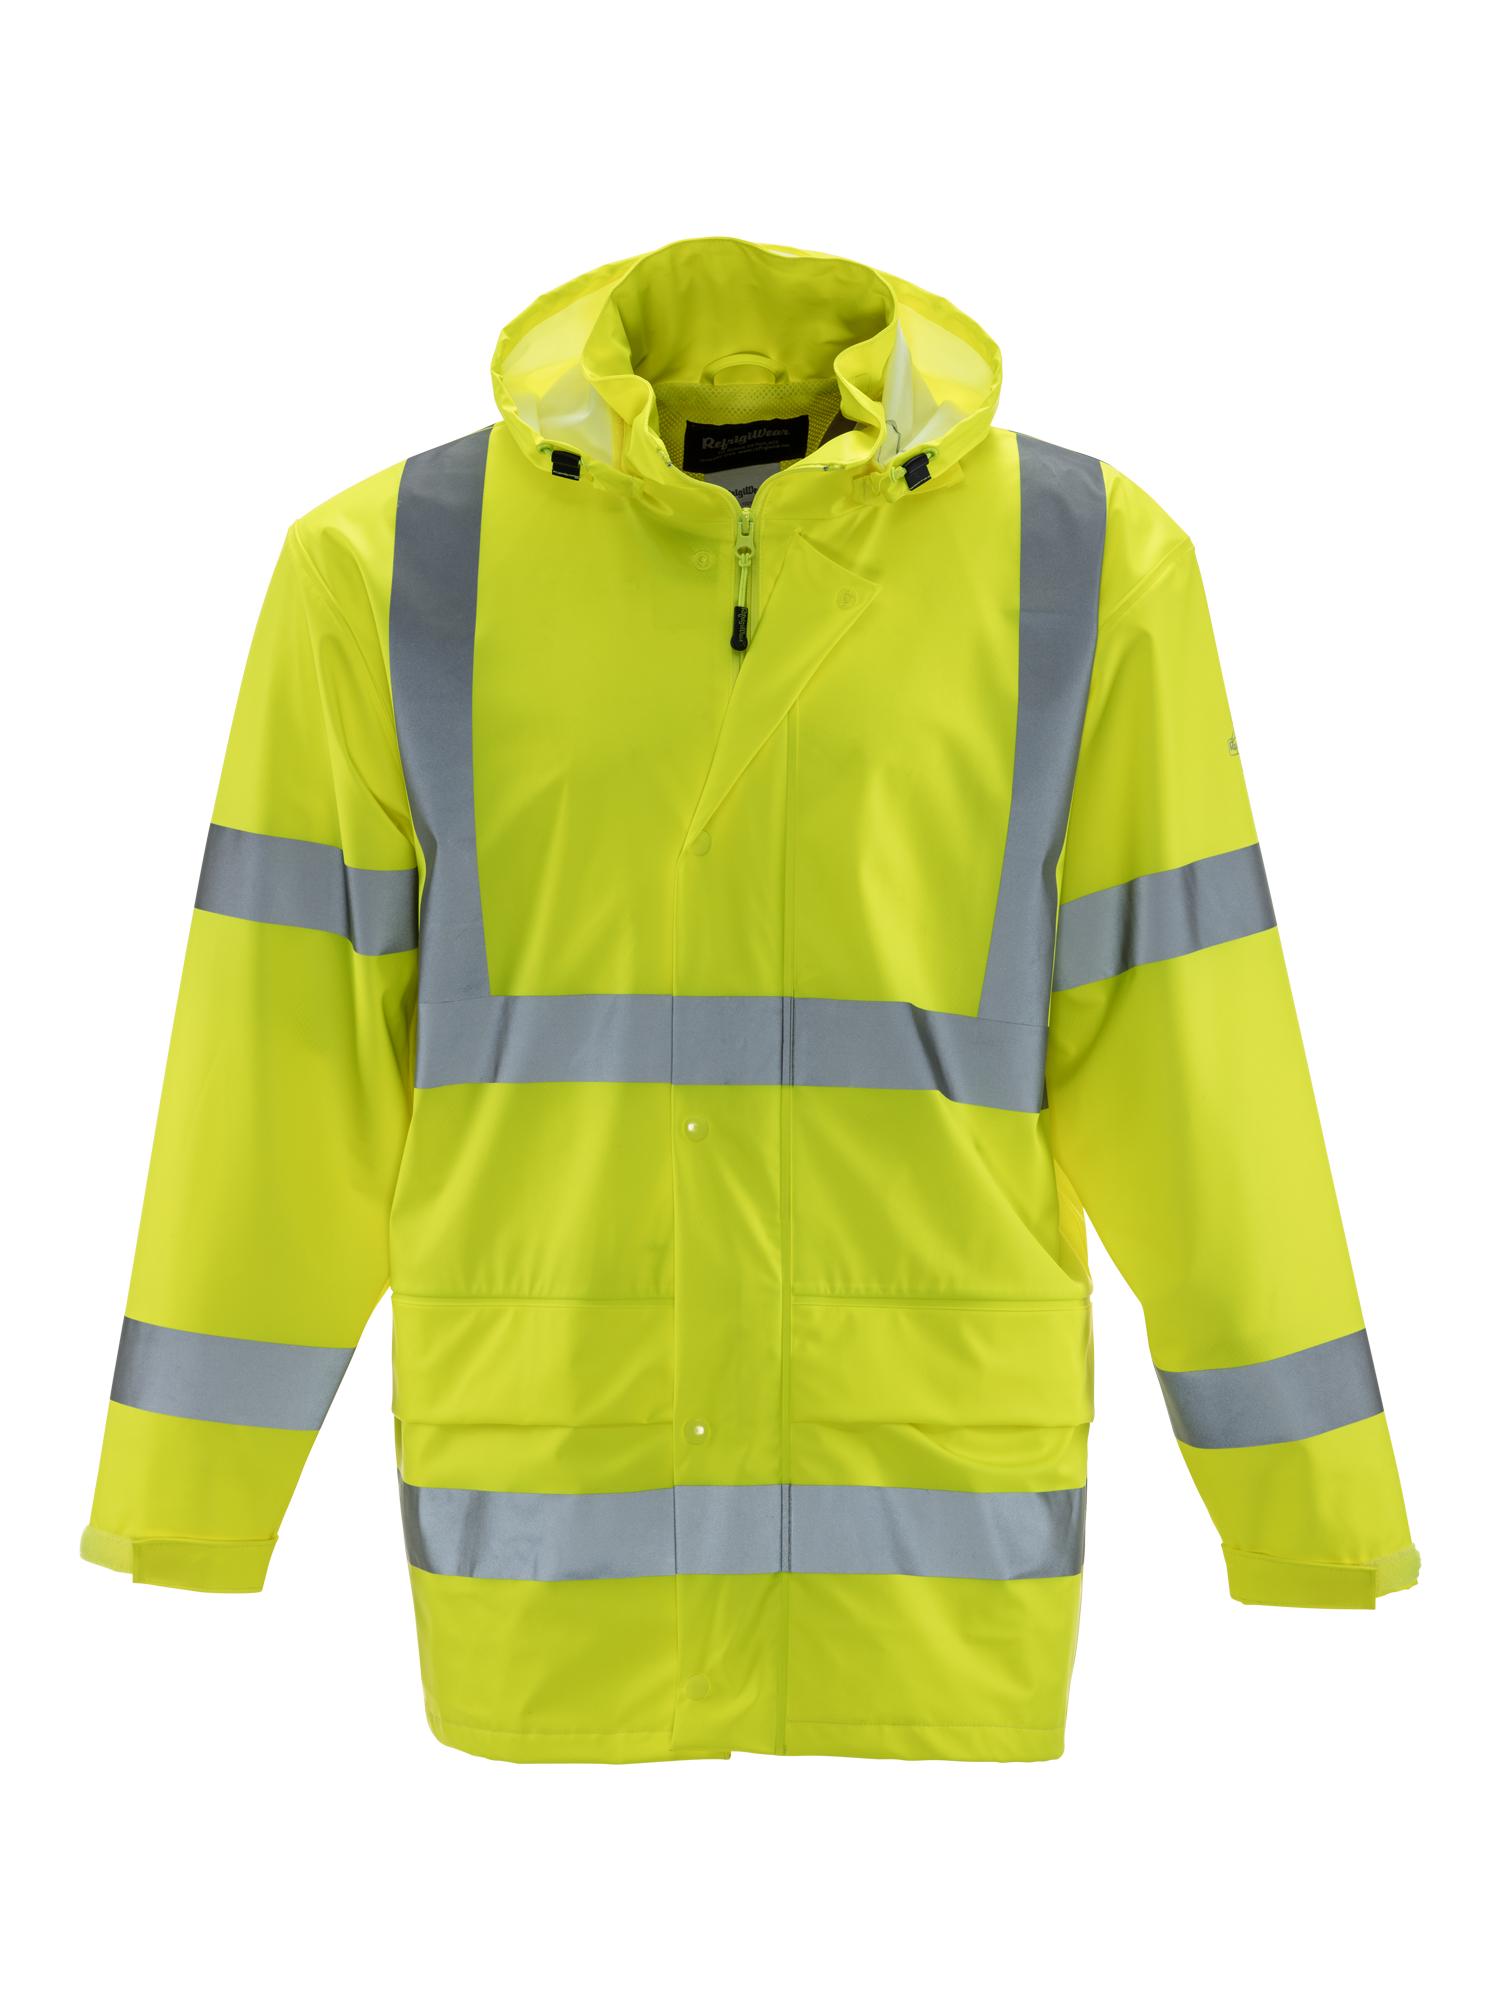 Refrigiwear | Hivis Lightweight Rainwear Jacket | Waterproof | Lime | Small | Regular | Polyester